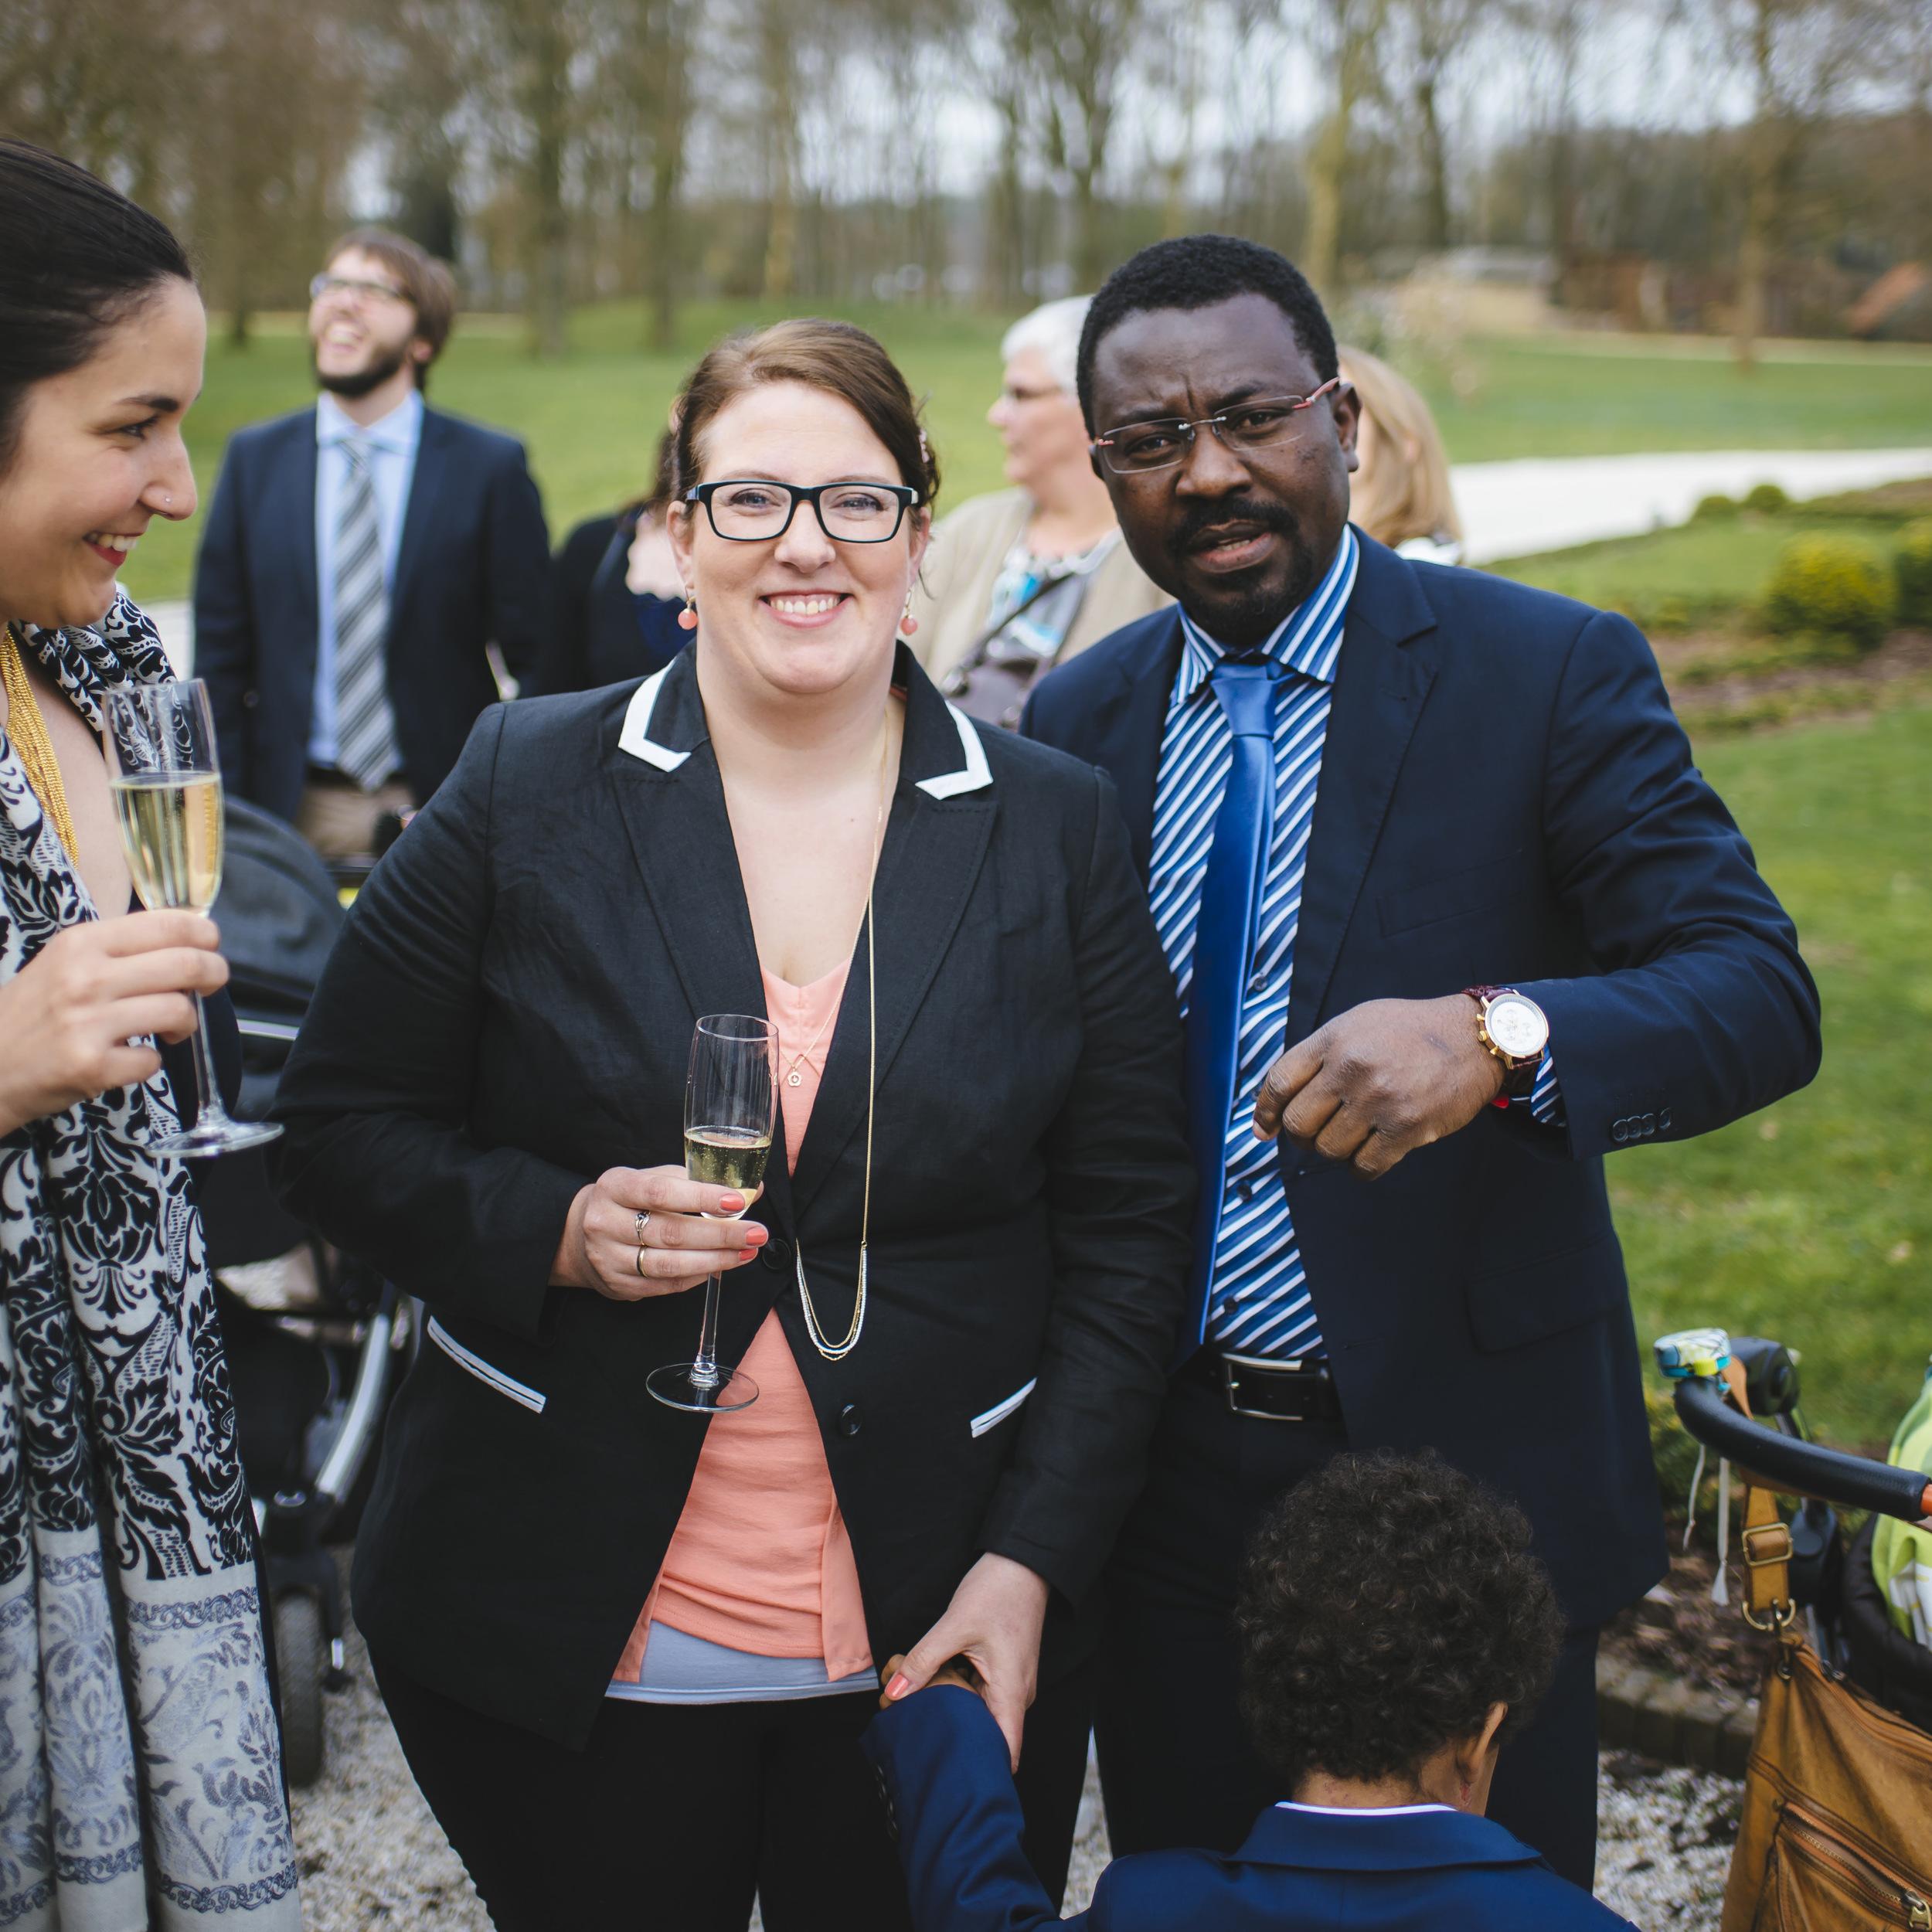 Hochzeitsfotograf-Schlossruine-Hertefeld-Weeze-097.jpg